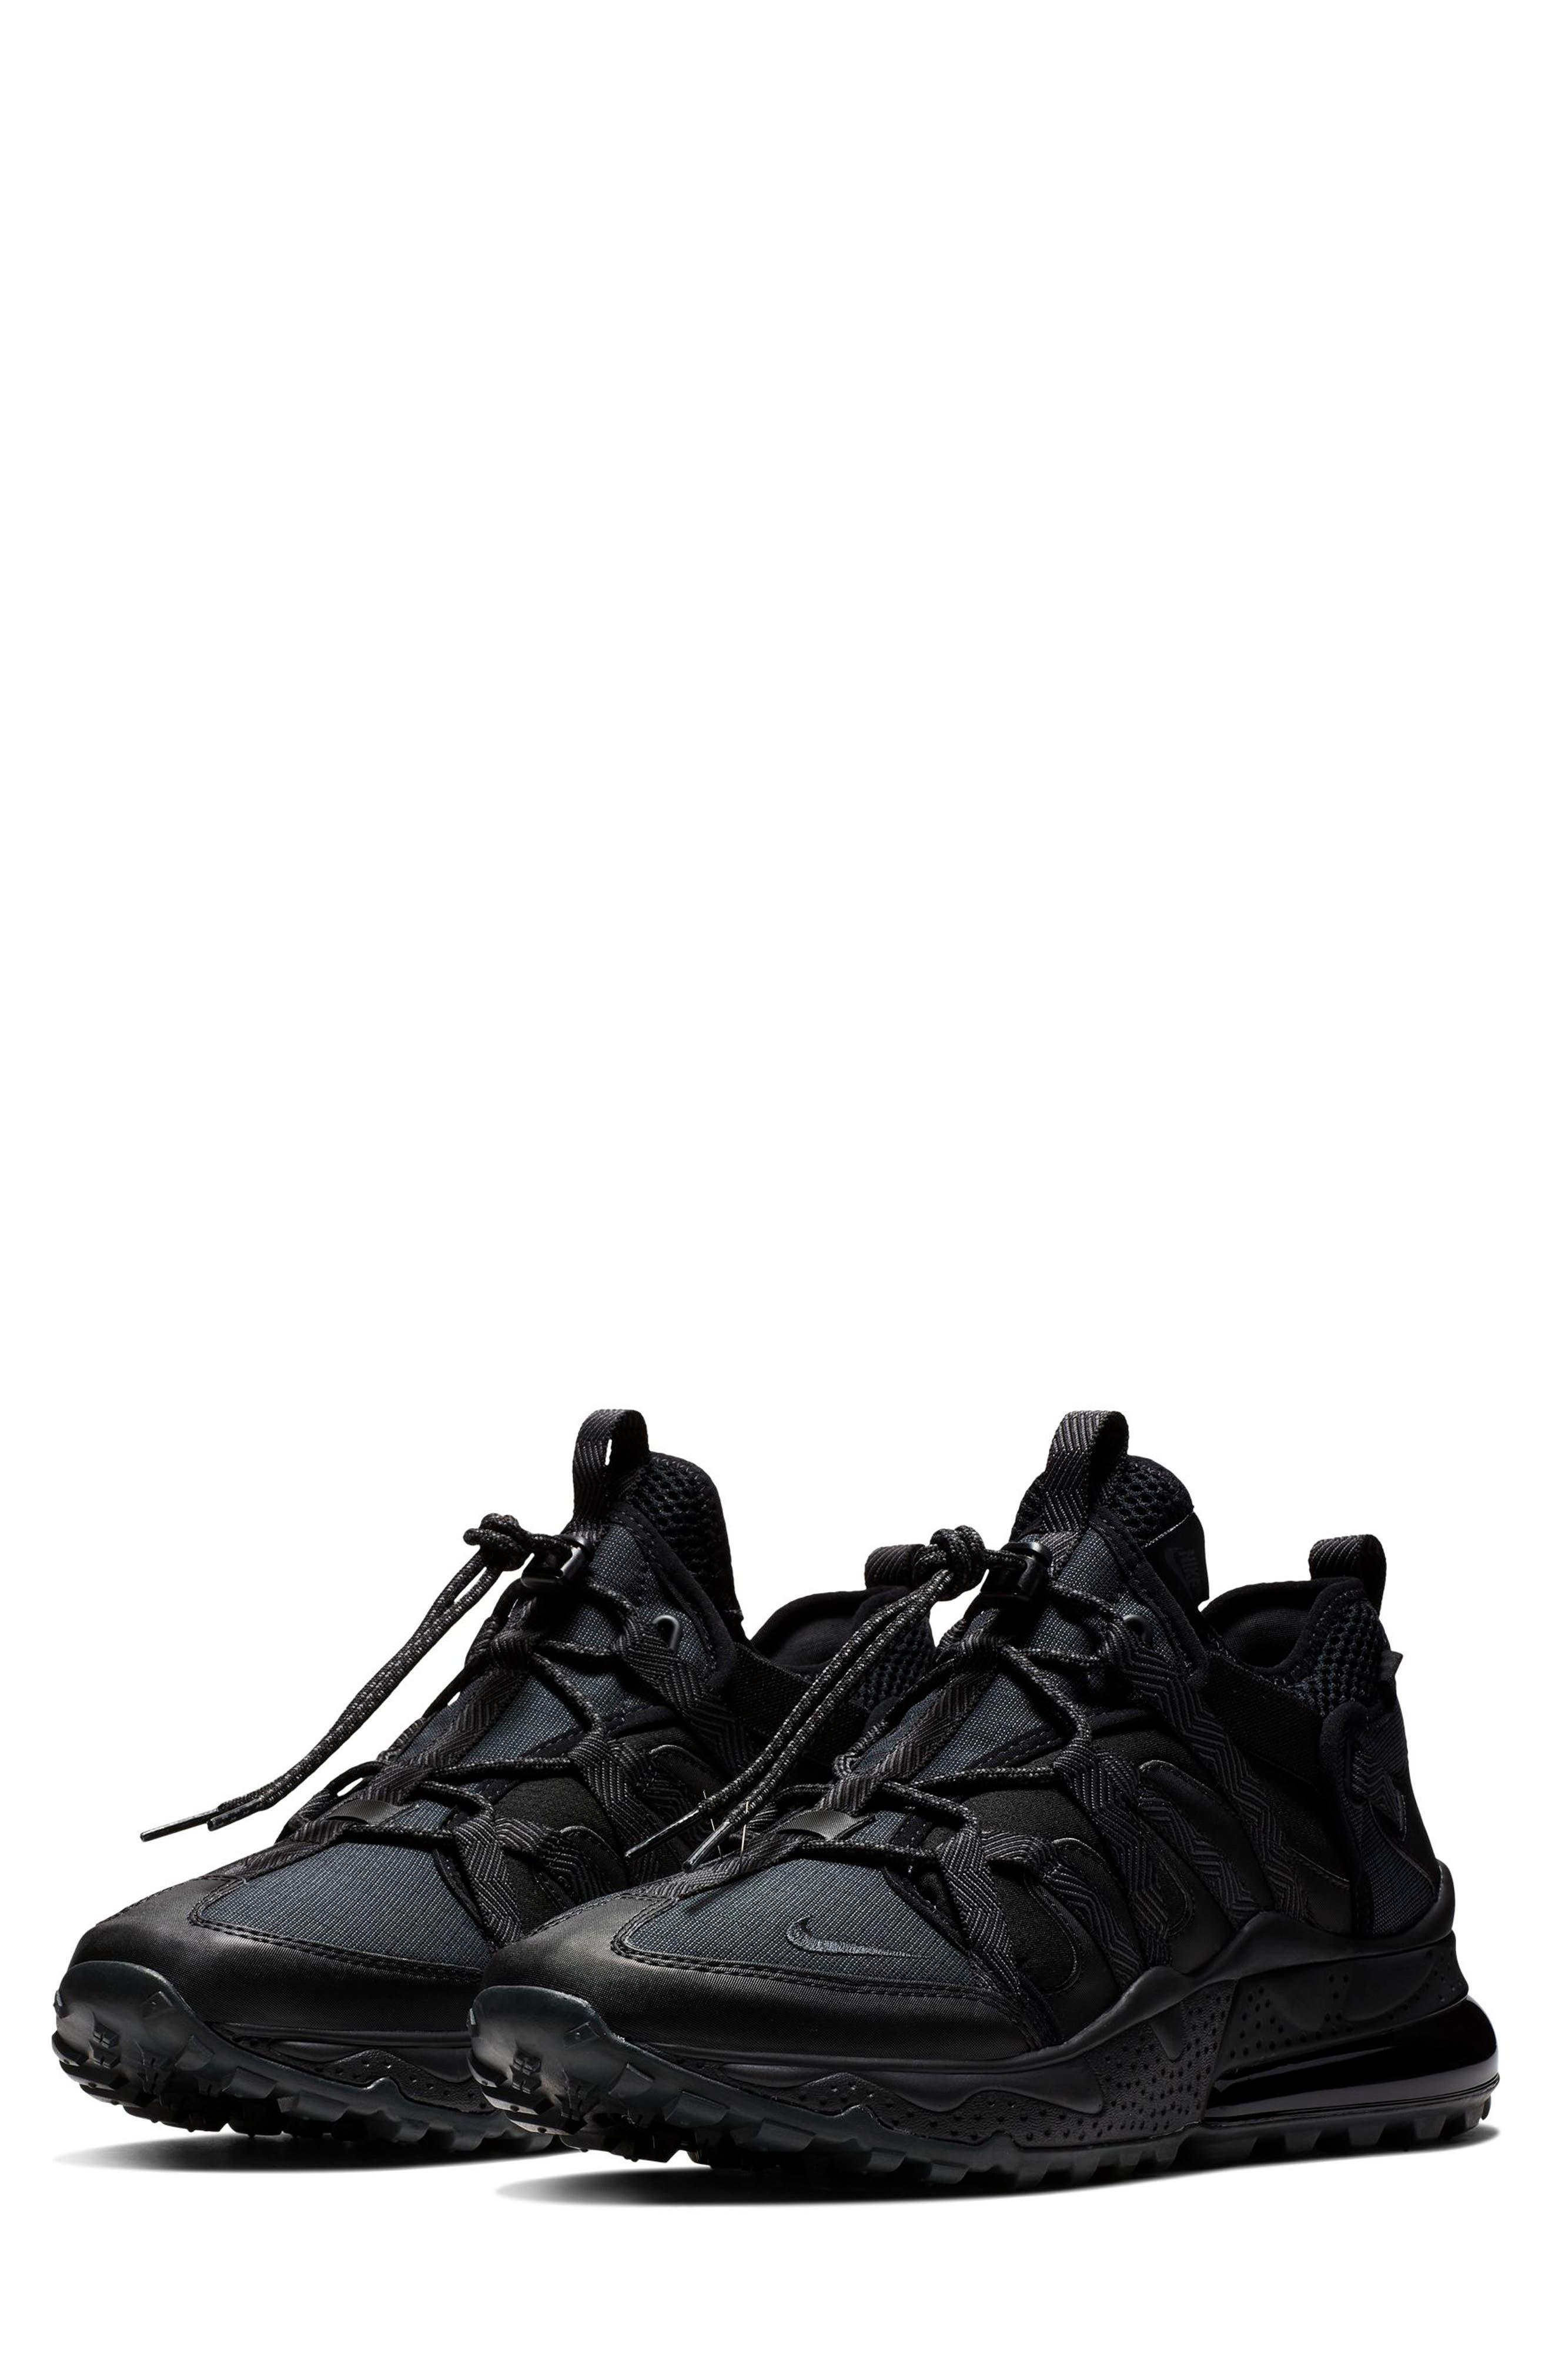 Air Max 270 Bowfin Sneaker,                             Main thumbnail 1, color,                             BLACK/ ANTHRACITE/ BLACK